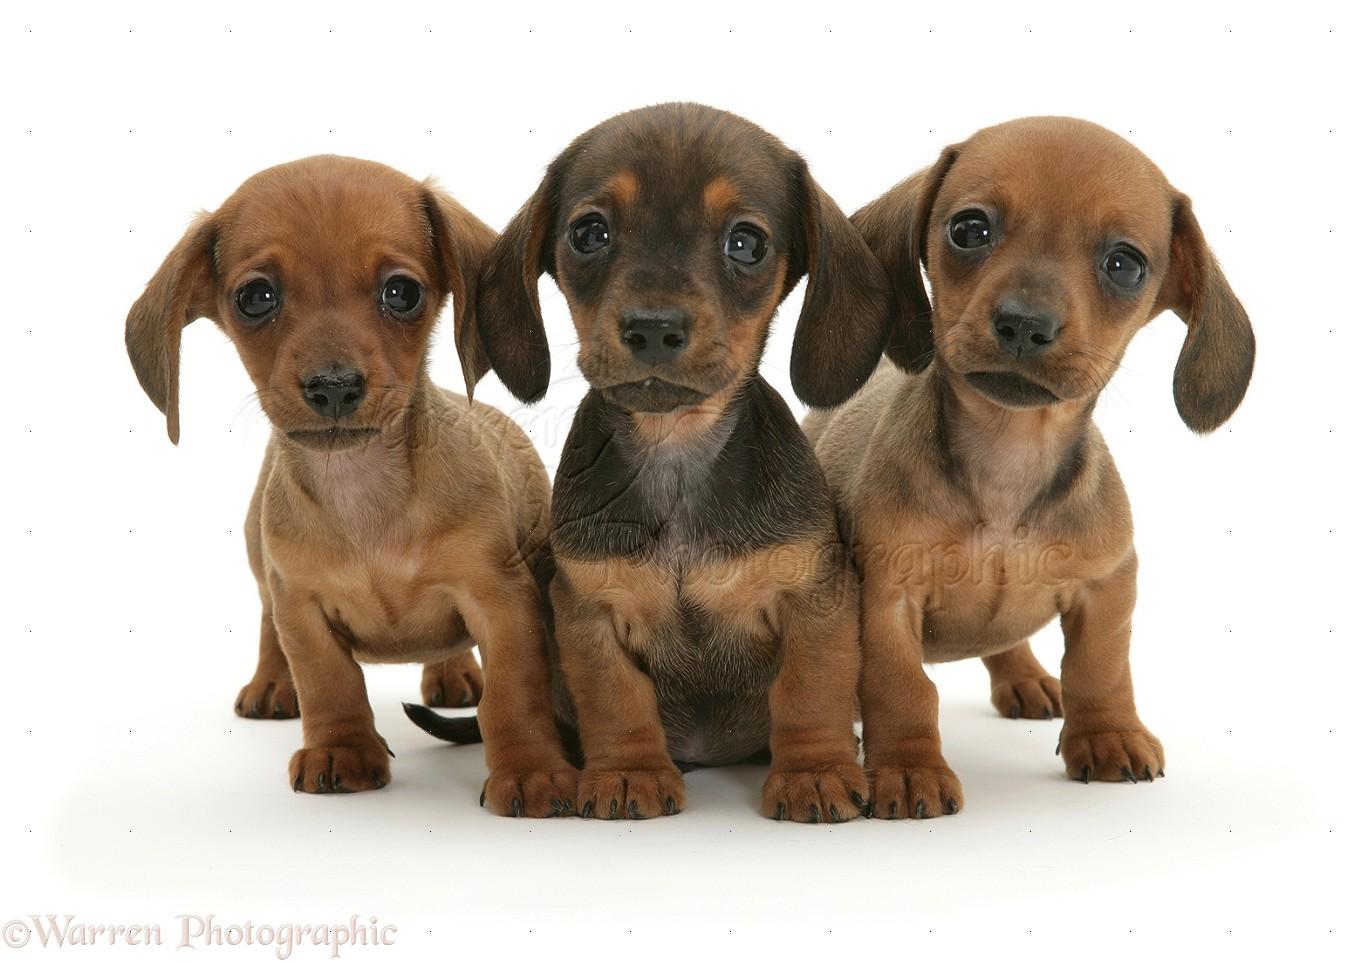 Dachshund Puppies: Dachshund Three Dachshund Puppies Breed